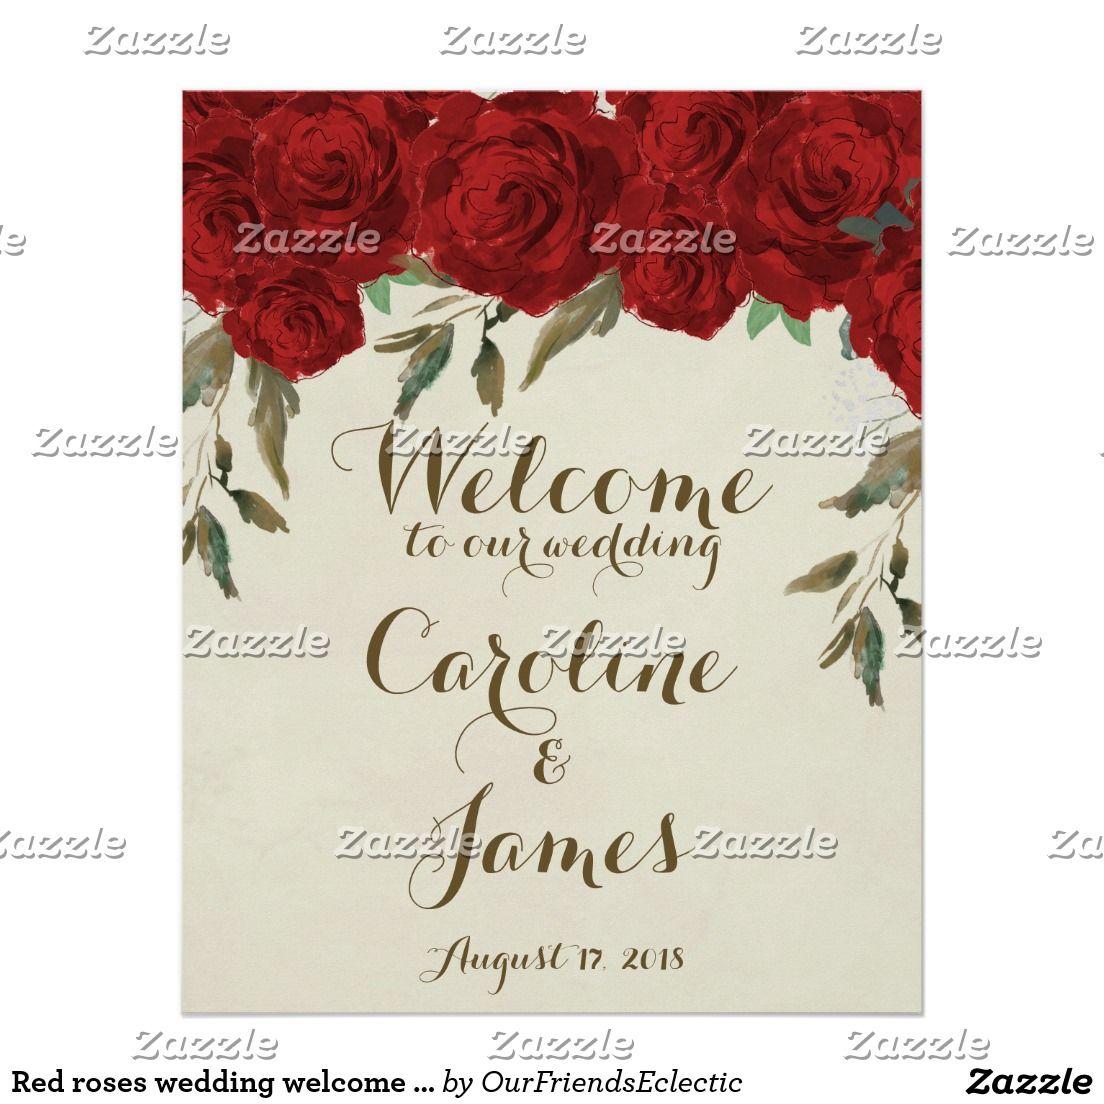 Awesome Wedding Invitation Acceptance Poem Frieze - Invitation Card ...